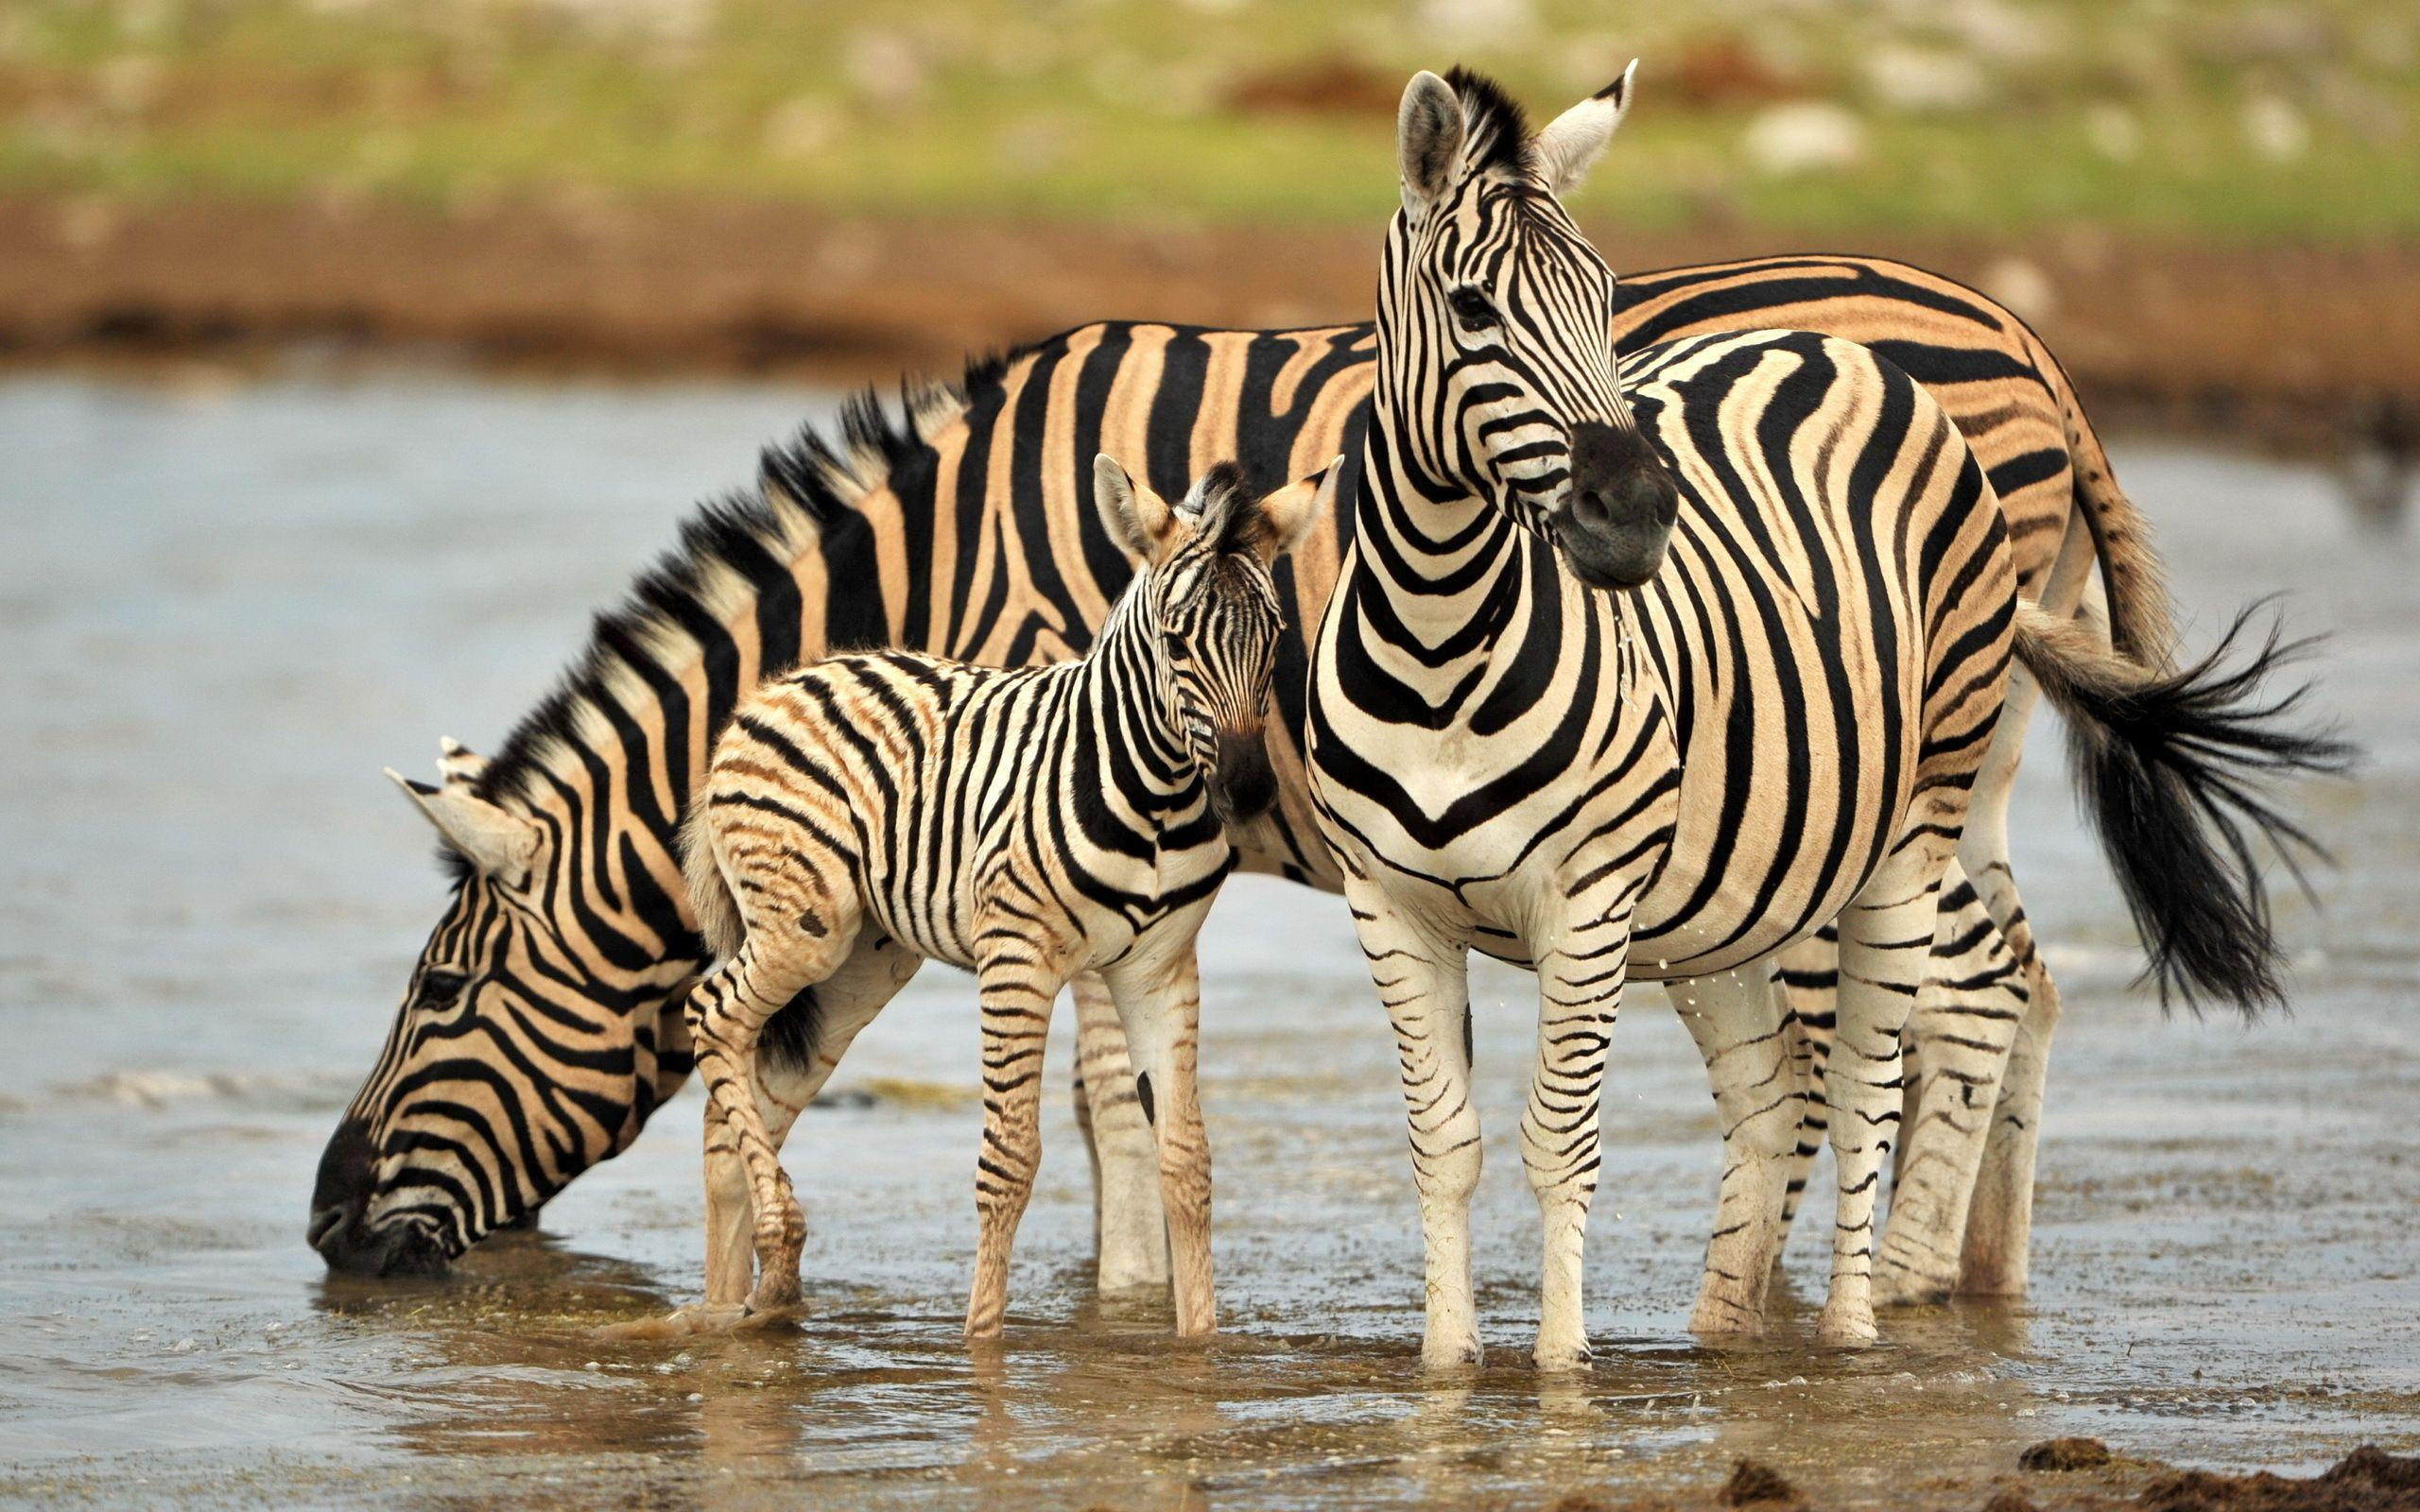 Zebra HD Wallpapers - Wallpaper Cave